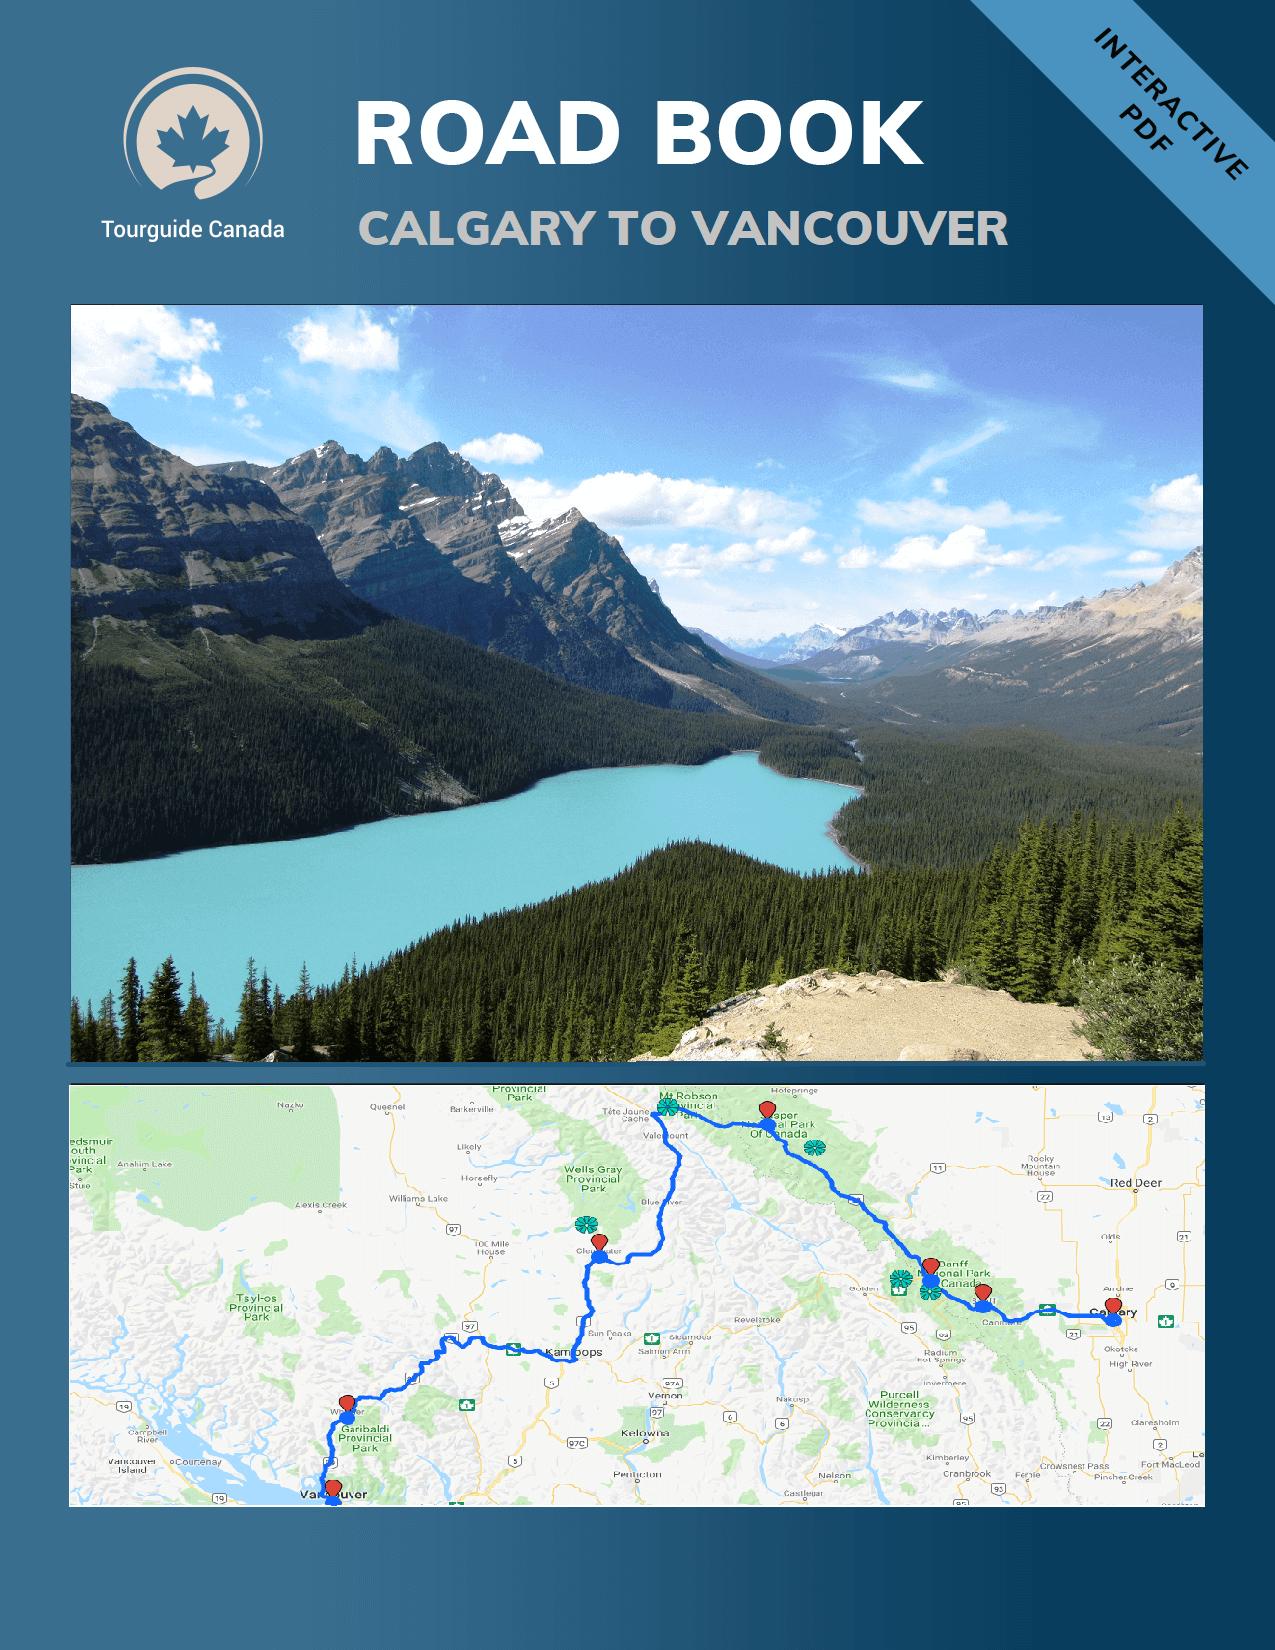 Calgary to Vancouver